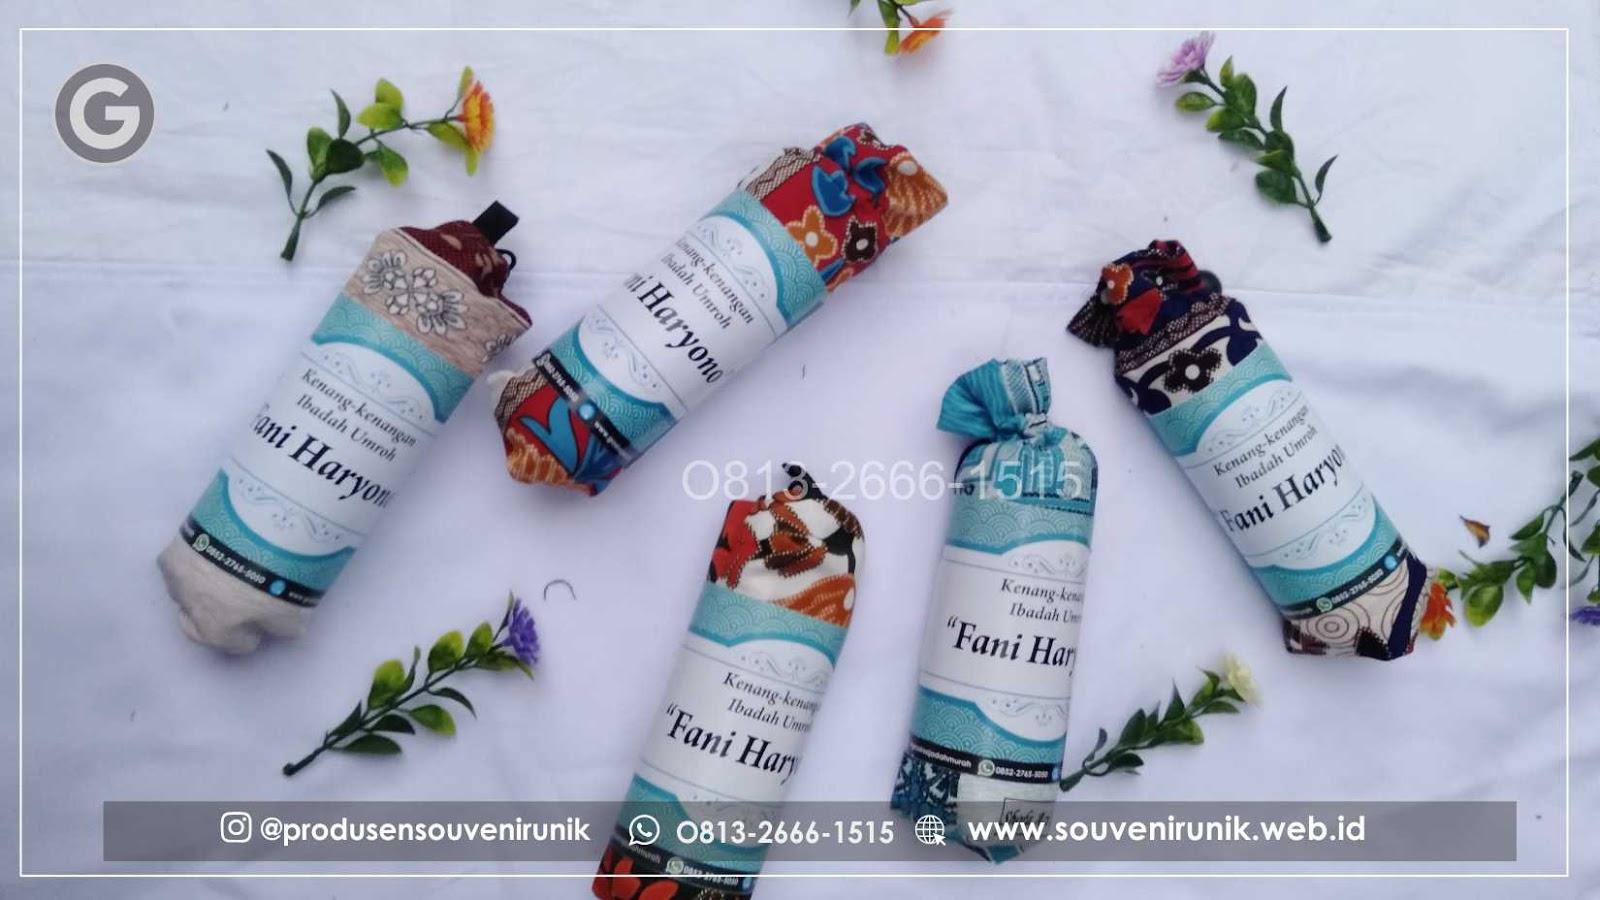 +62 813-2666-1515 | souvenir reuni sekolah